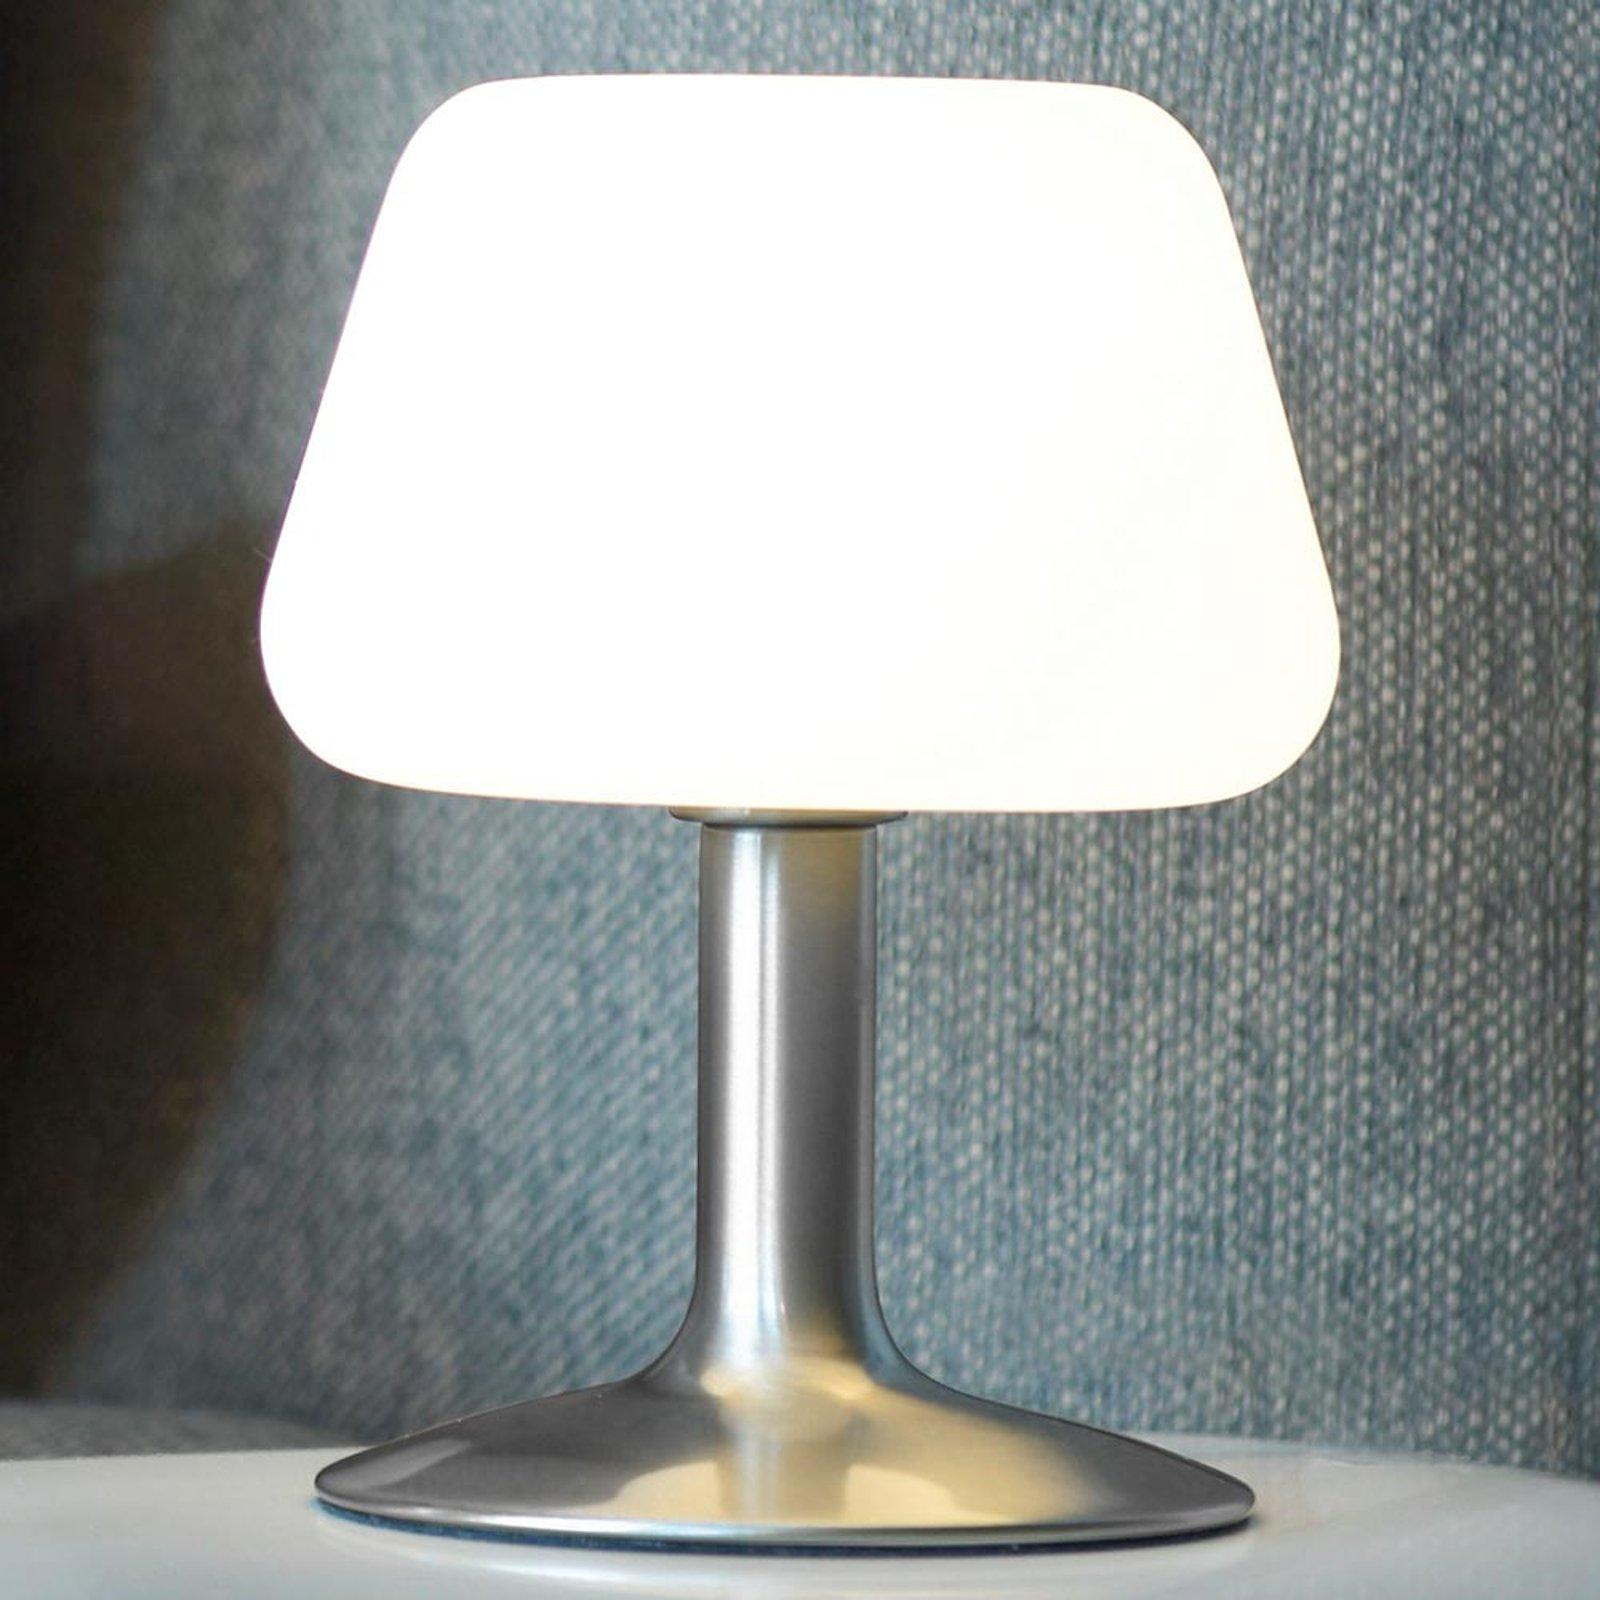 Liten LED-bordlampe Till med touchdimmer, stål